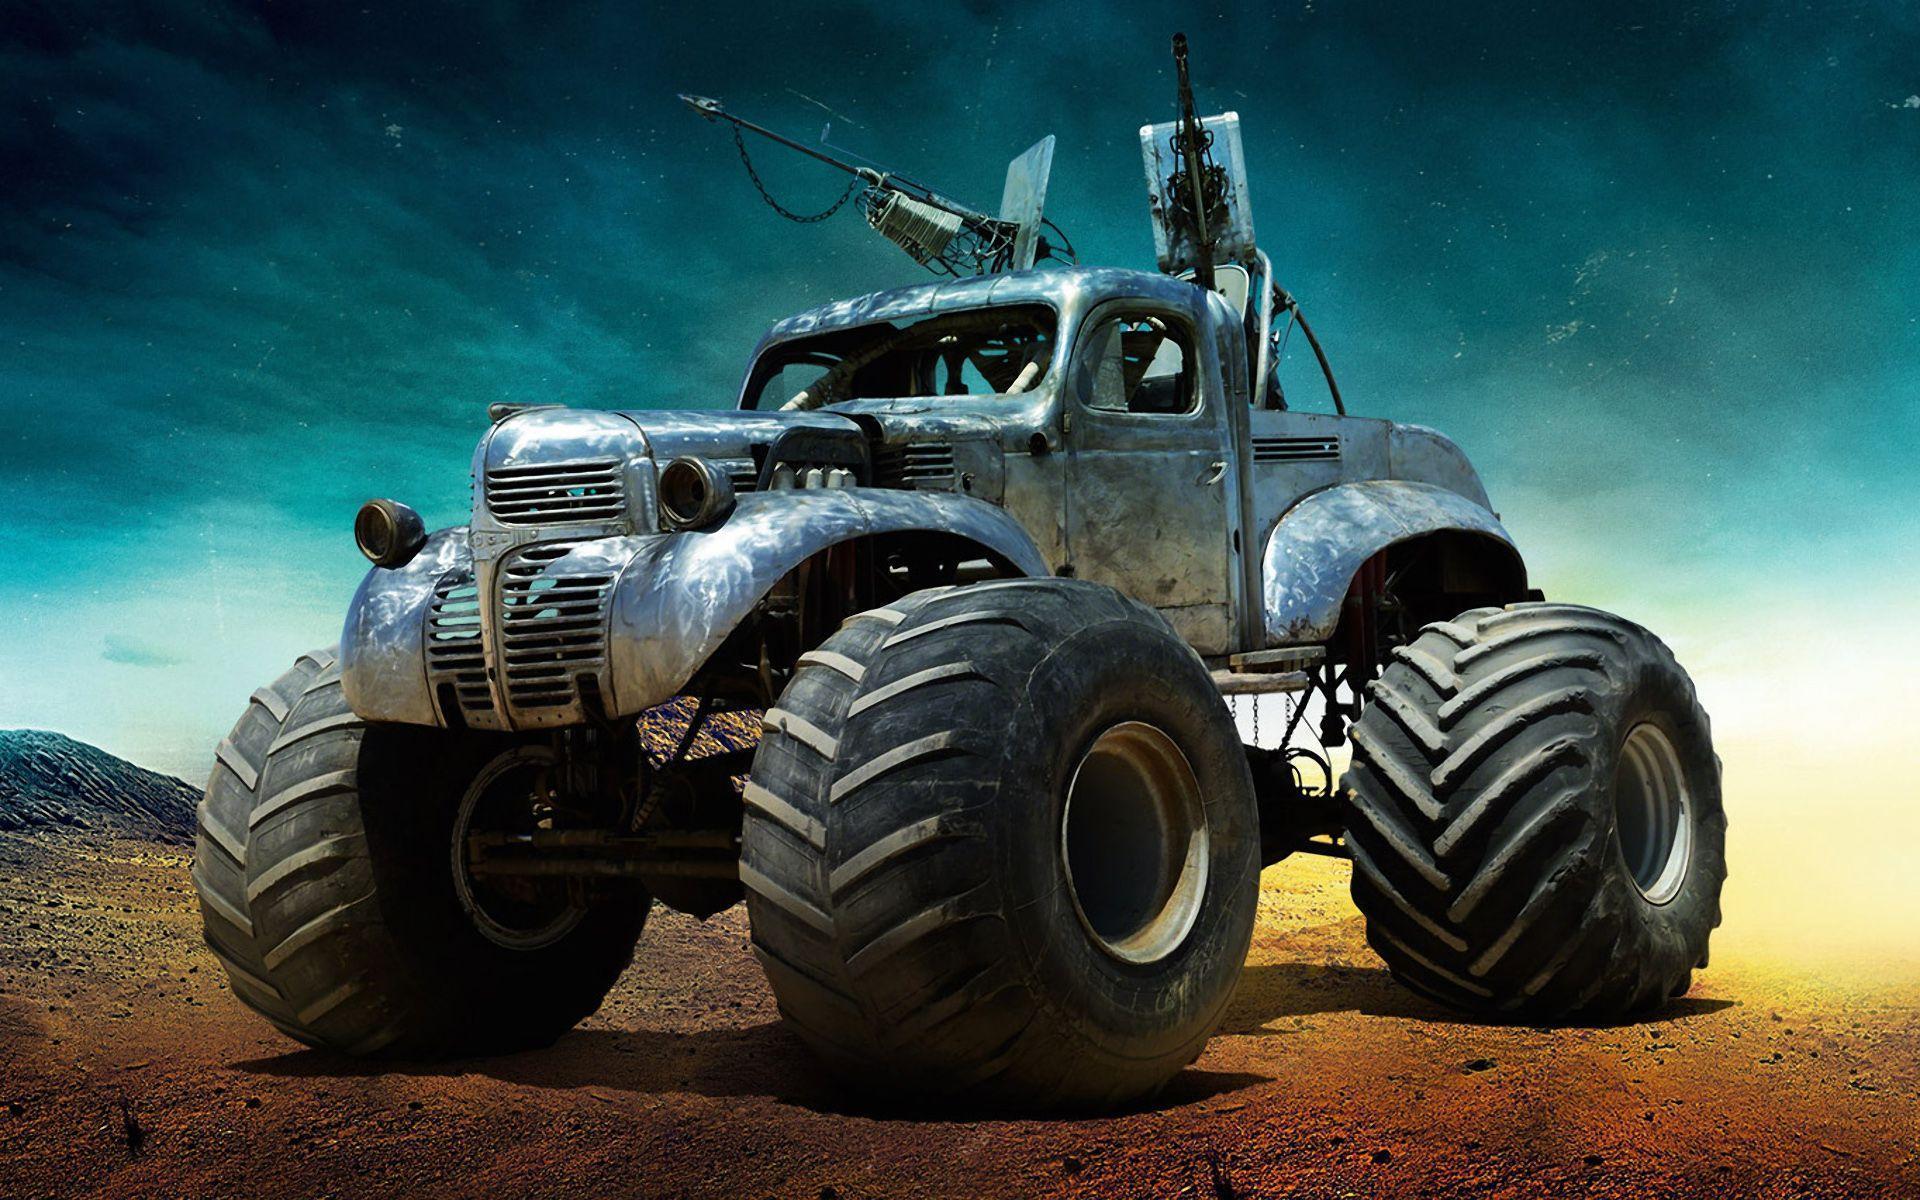 Big Foot Mad Max Wallpaper | Full HD Pictures